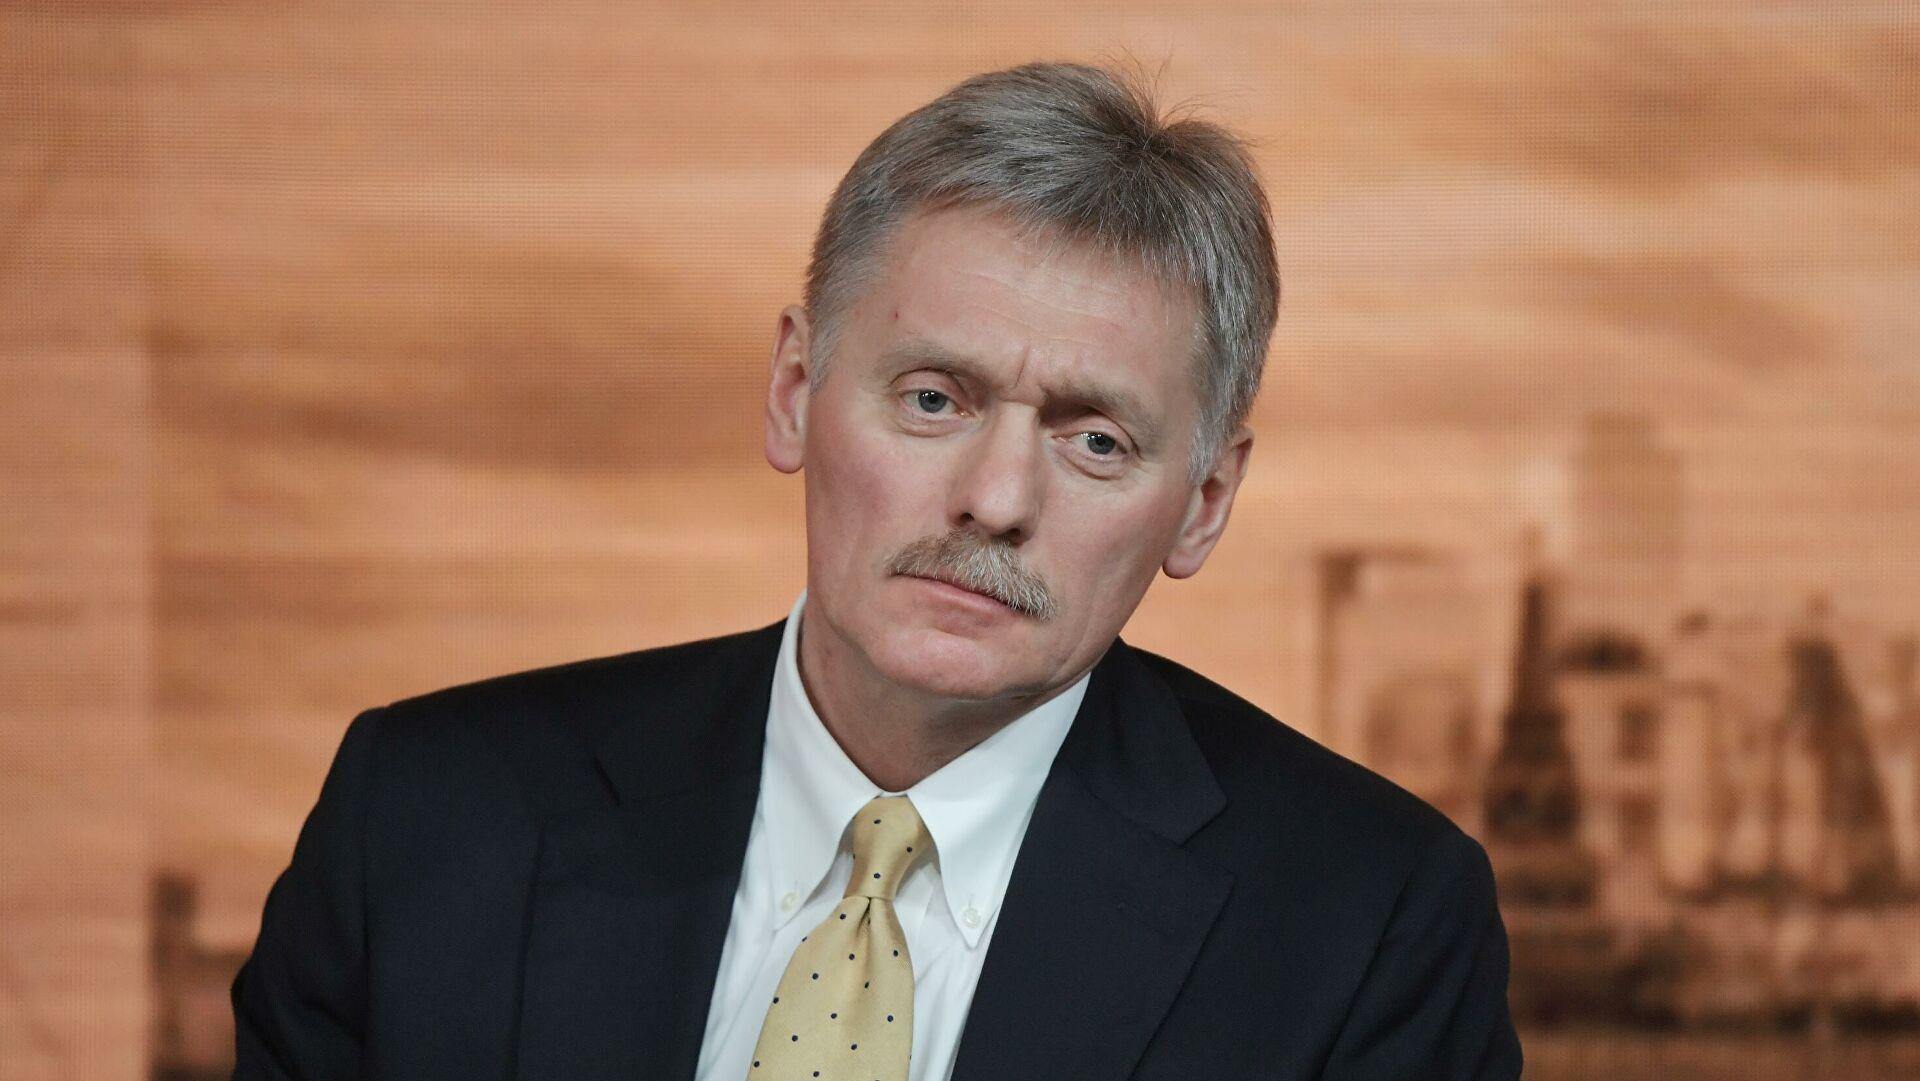 Peskov: Na neprijateljske sankcije je trebalo dati odgovor koji je dat